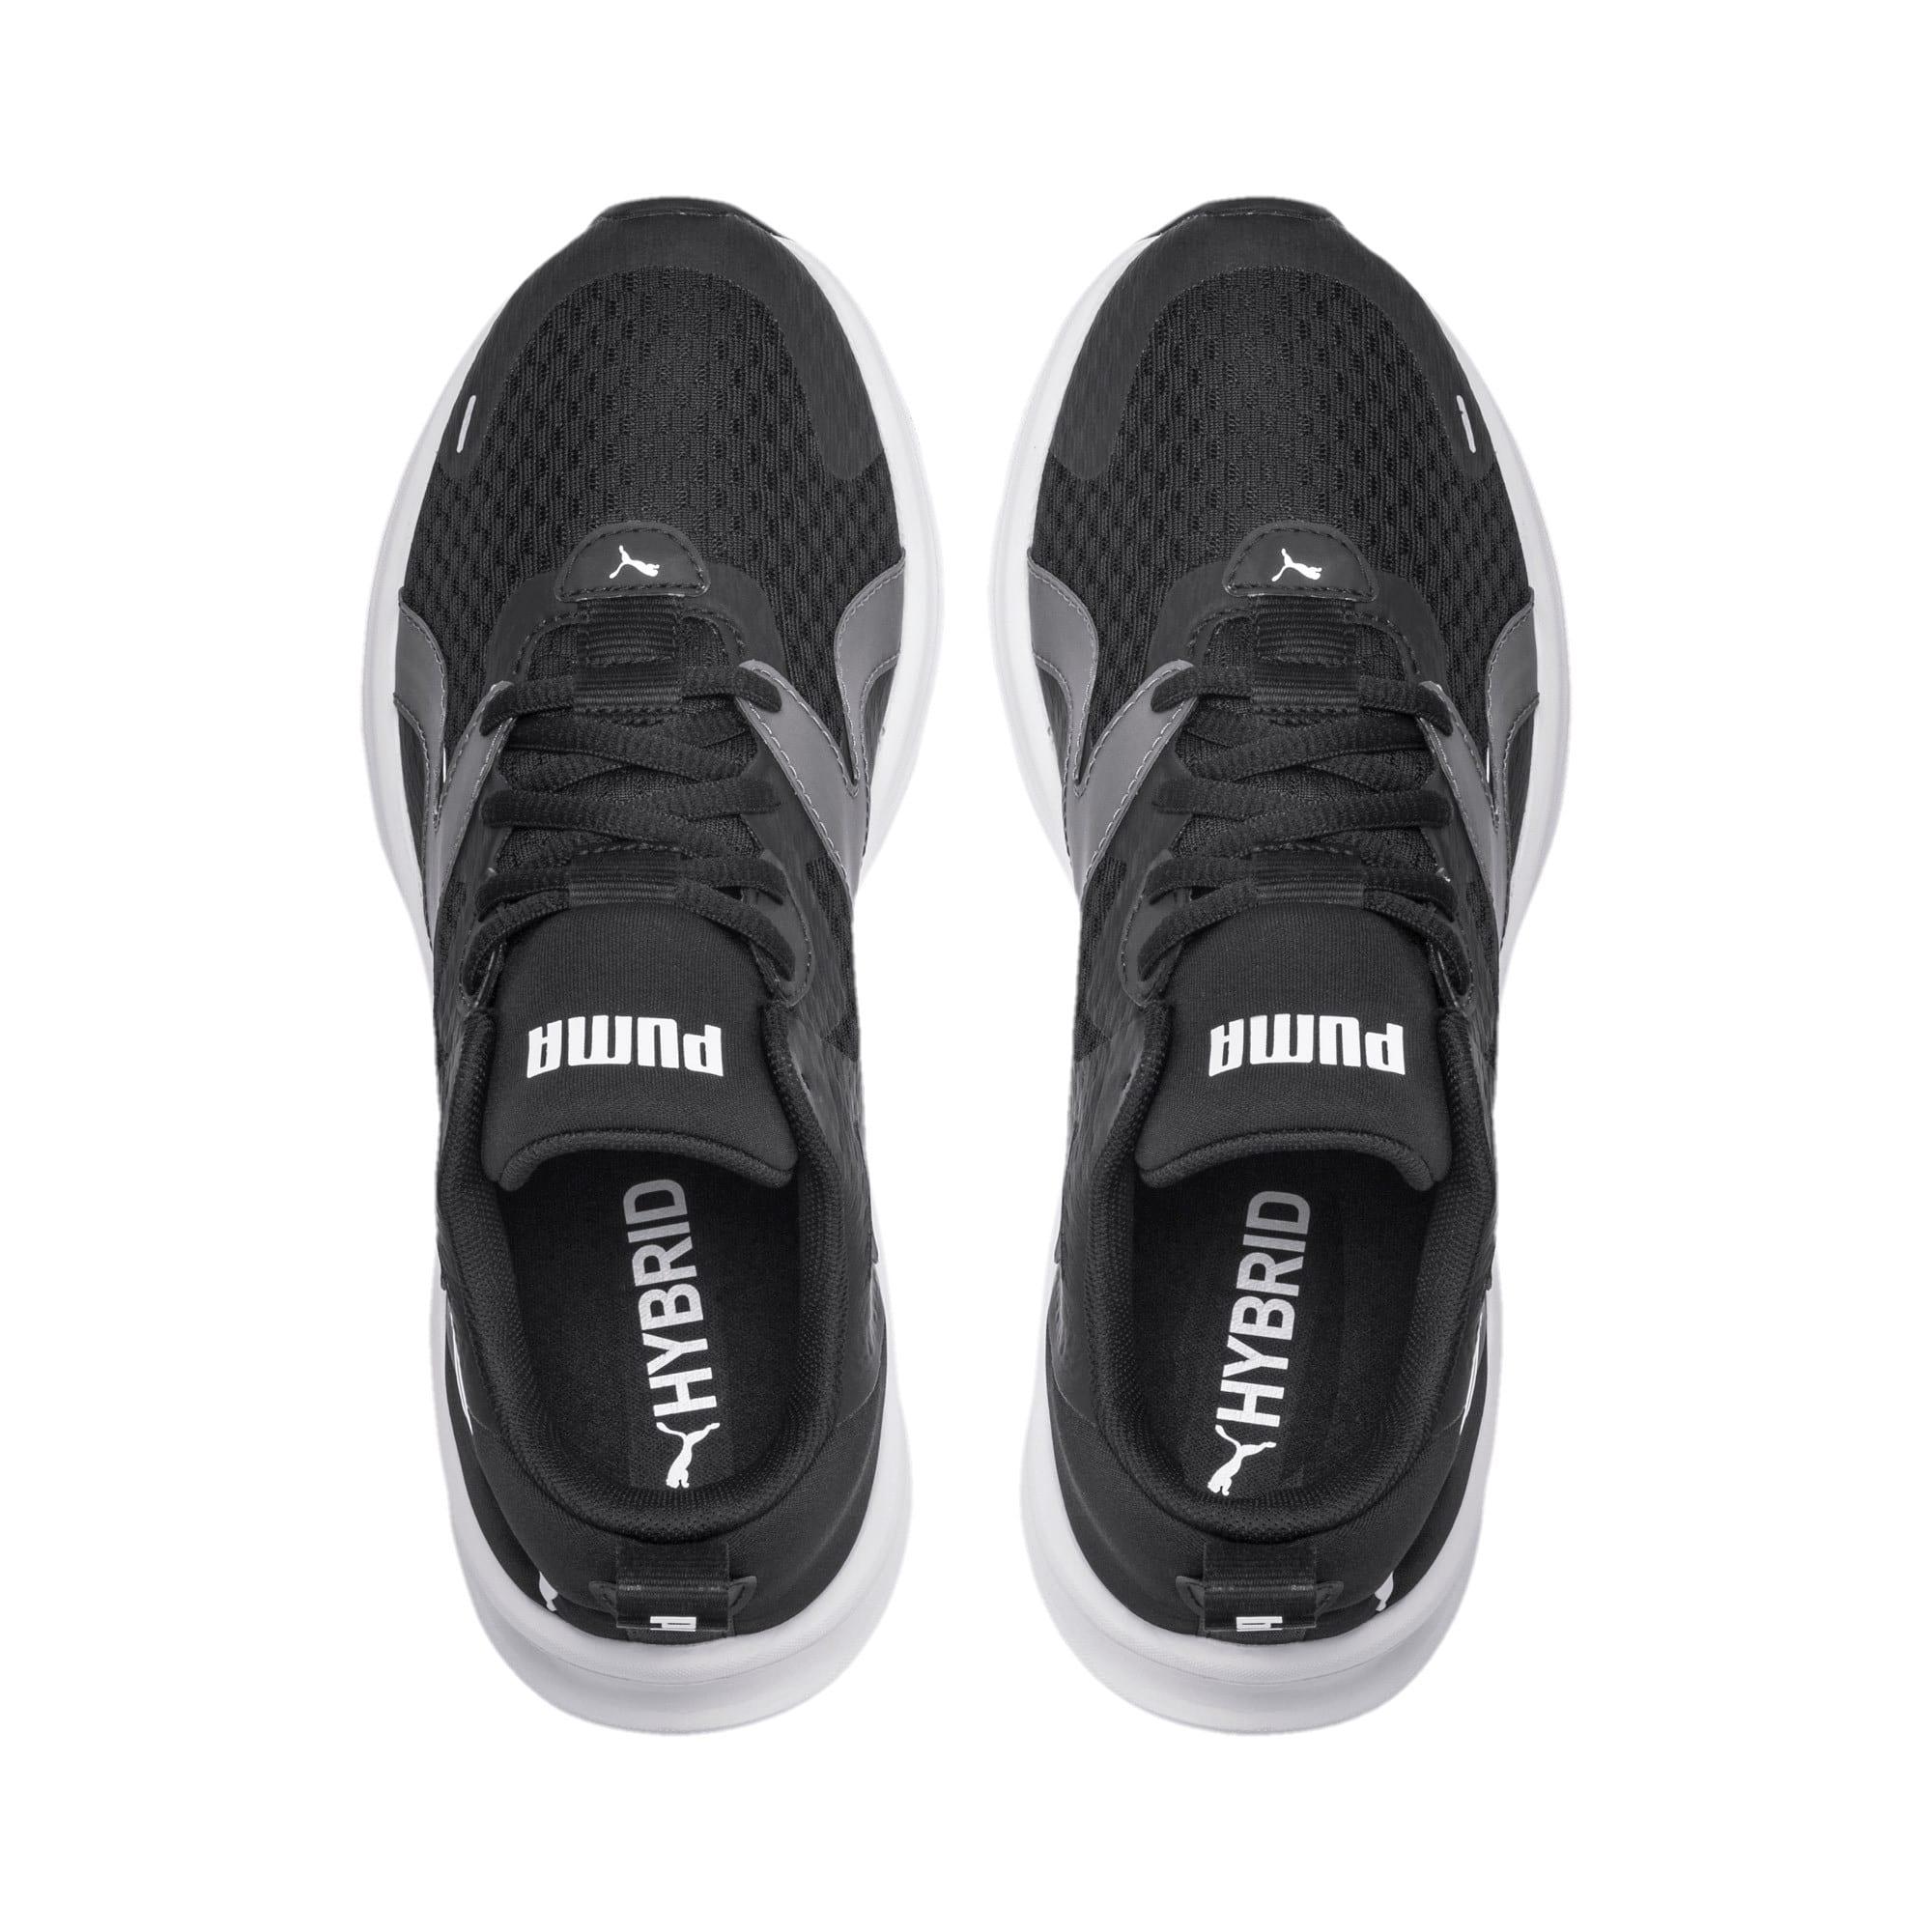 Thumbnail 6 of Damskie buty do biegania HYBRID Fuego, Puma Black-Puma White, medium